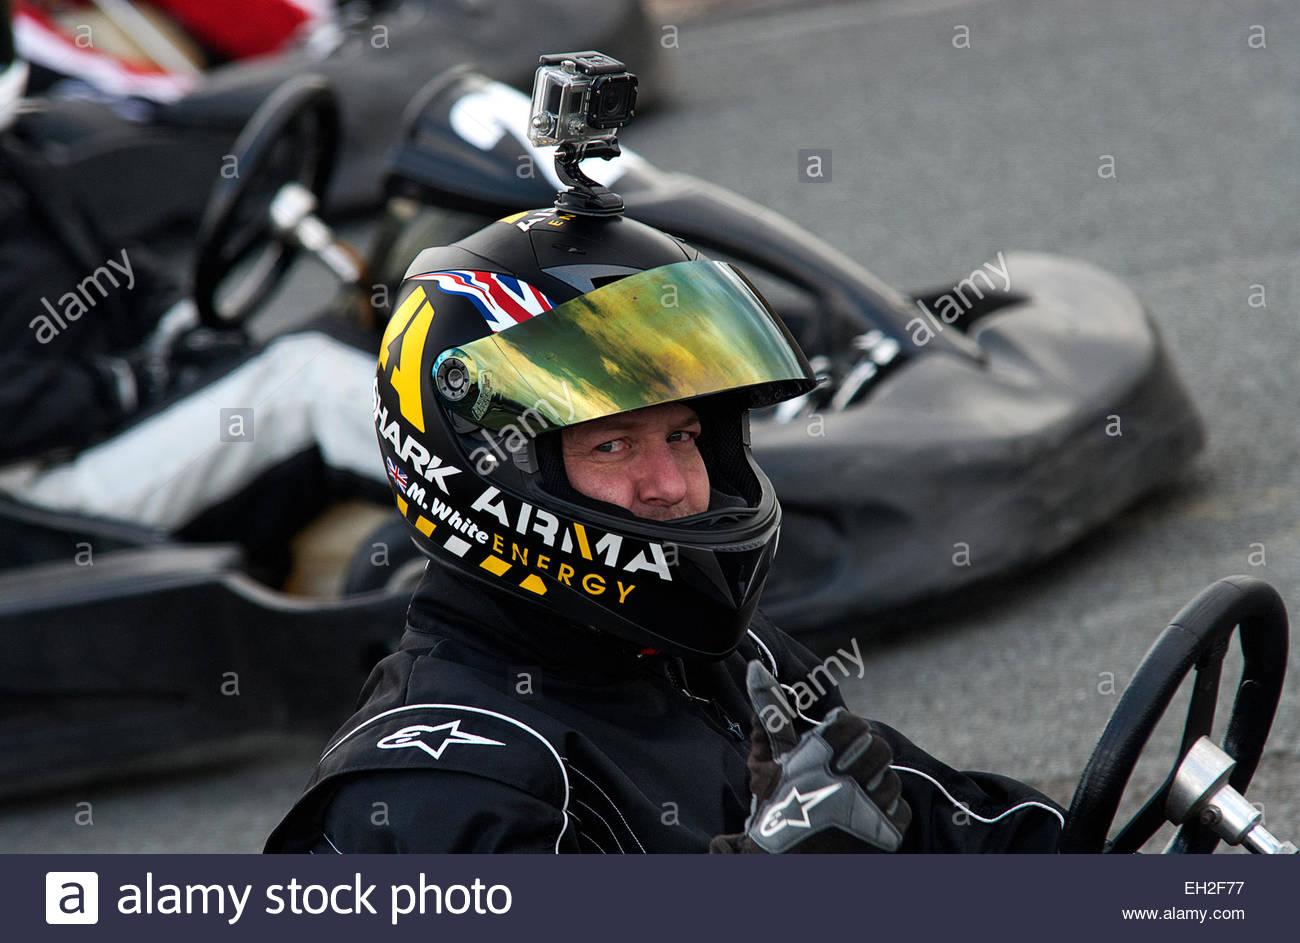 Go-kart / Go-Cart,Go-Karting,karts,Championship race,held at